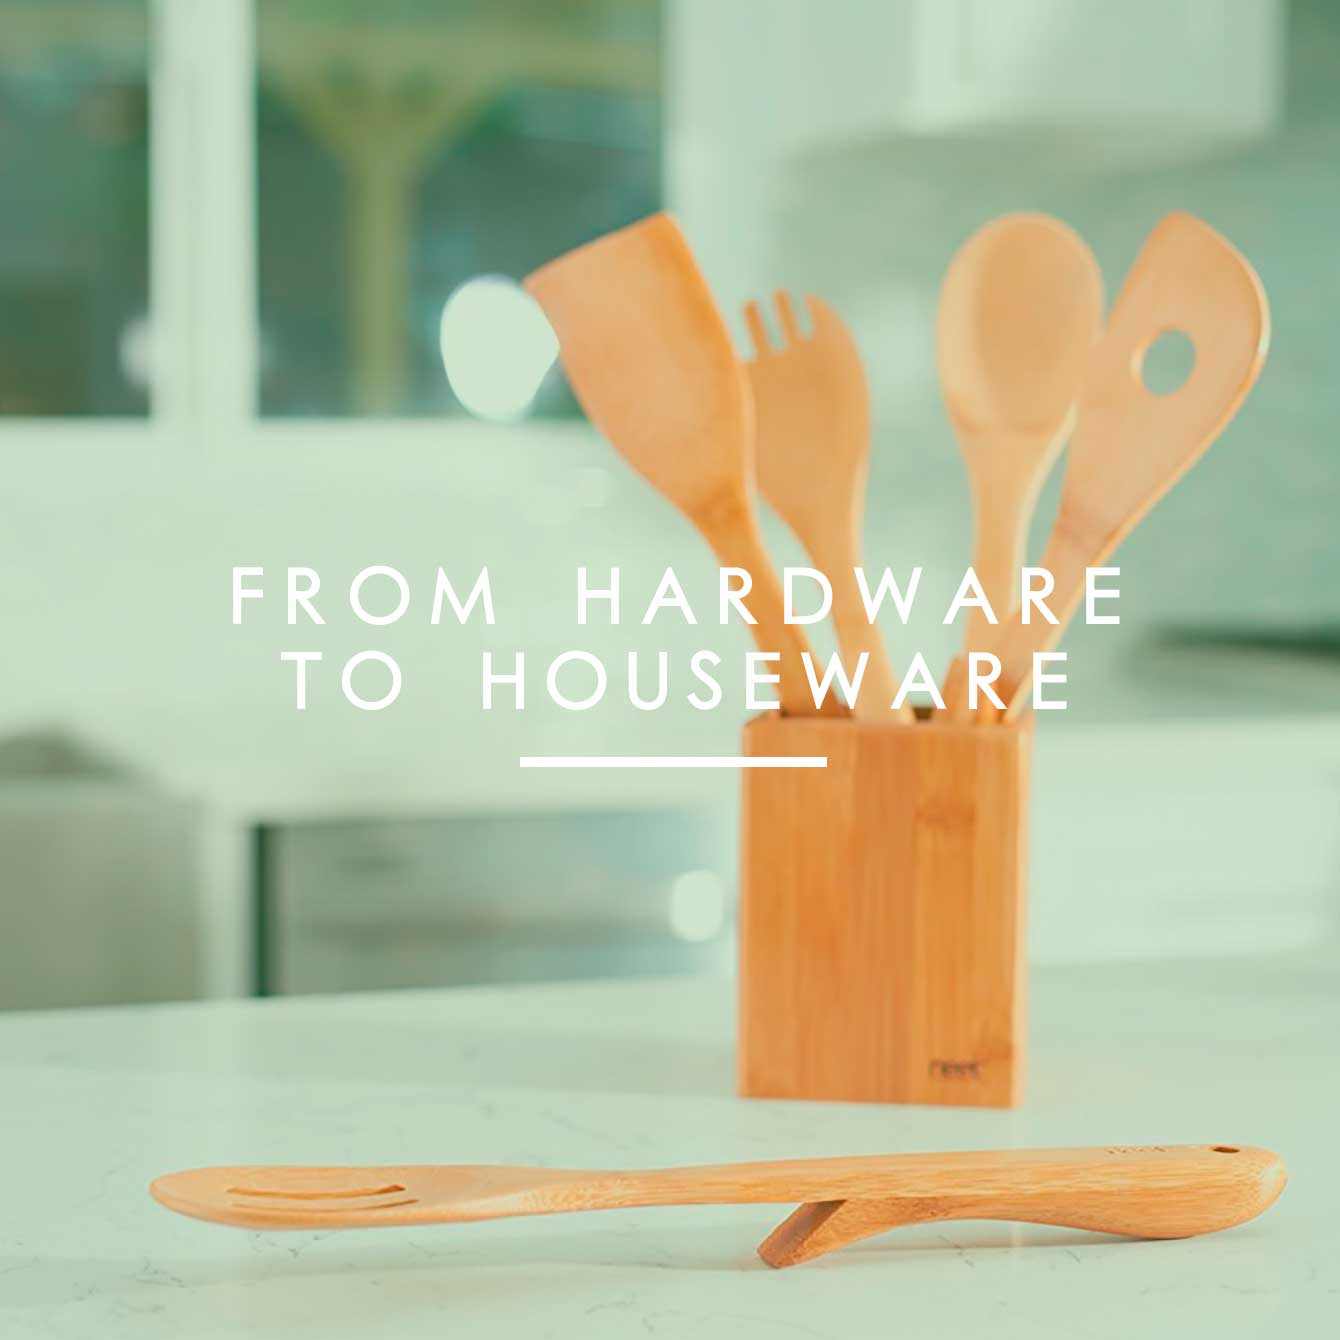 Amazon Exclusives: Hardware to Houseware